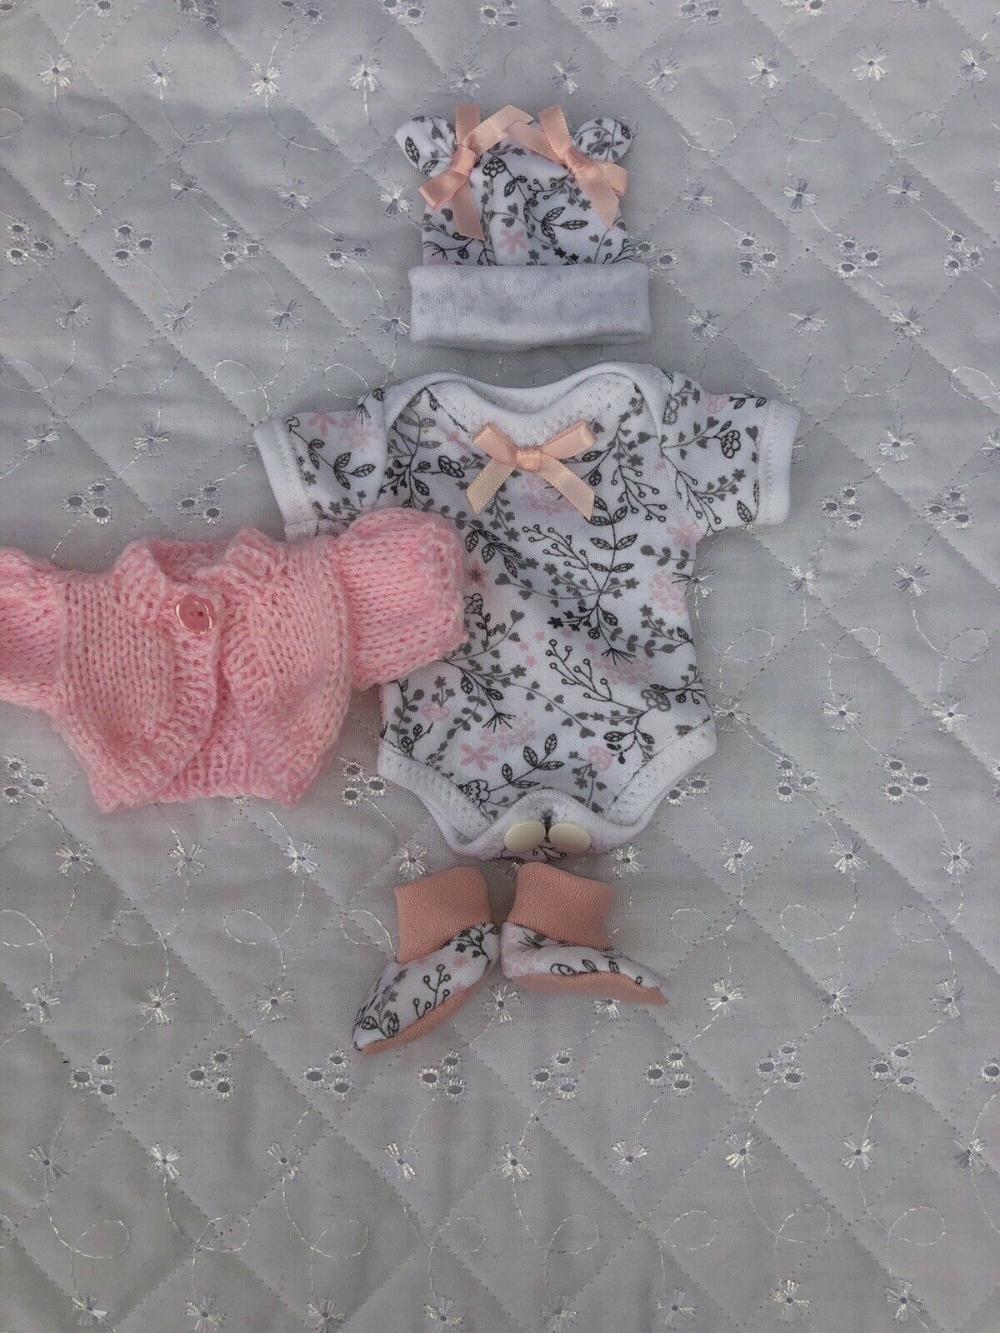 Handmade Clothes For 8 Reborn Sculpt Ooak Baby Doll Doll Not Included Ebay Baby Doll Clothes Handmade Clothes Baby Dolls